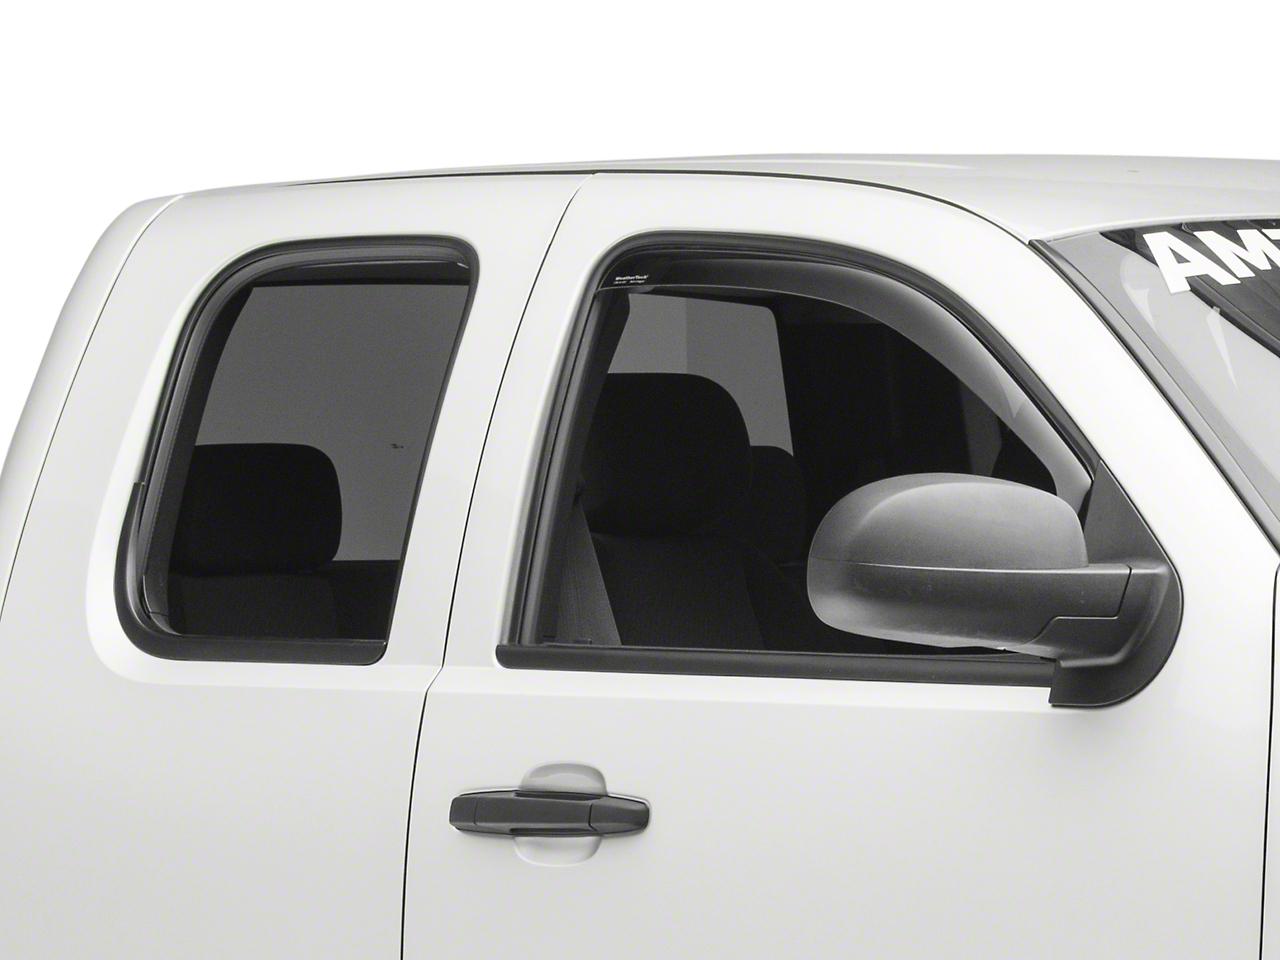 Weathertech Front Side Window Deflectors - Dark Smoke (07-13 Silverado 1500)